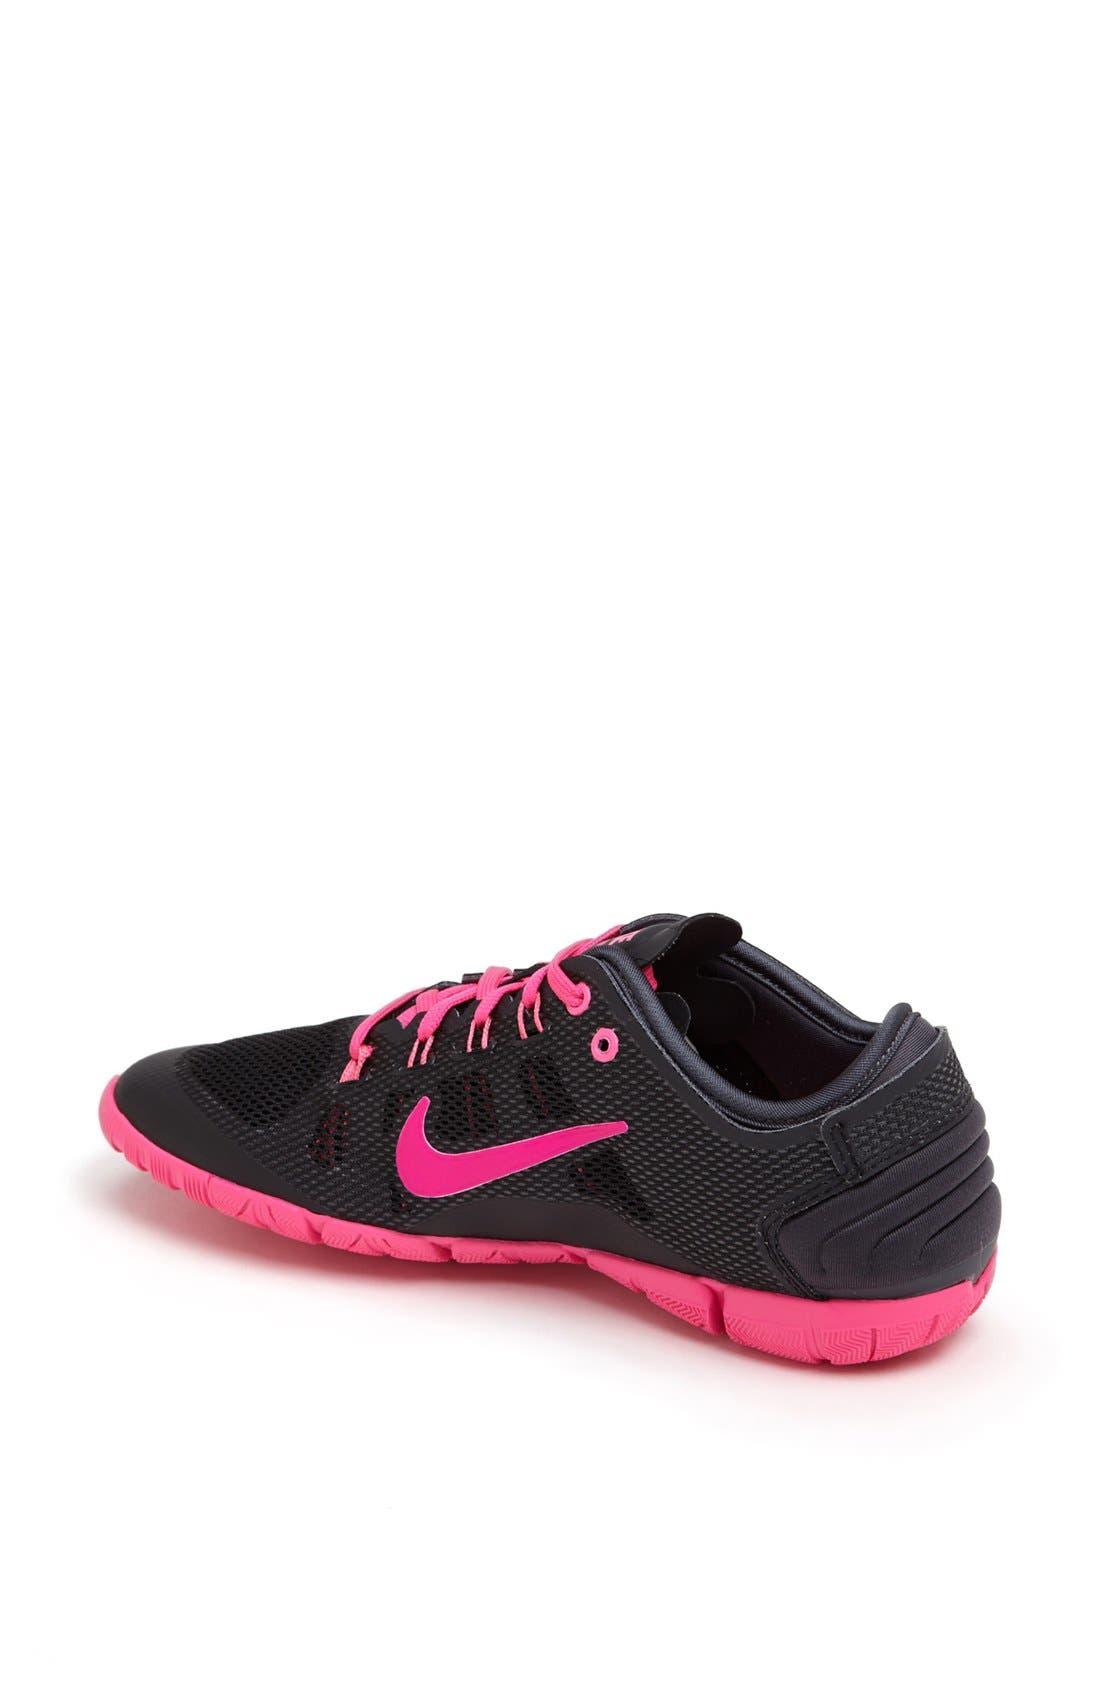 Alternate Image 2  - Nike 'Free Bionic' Training Shoe (Women)